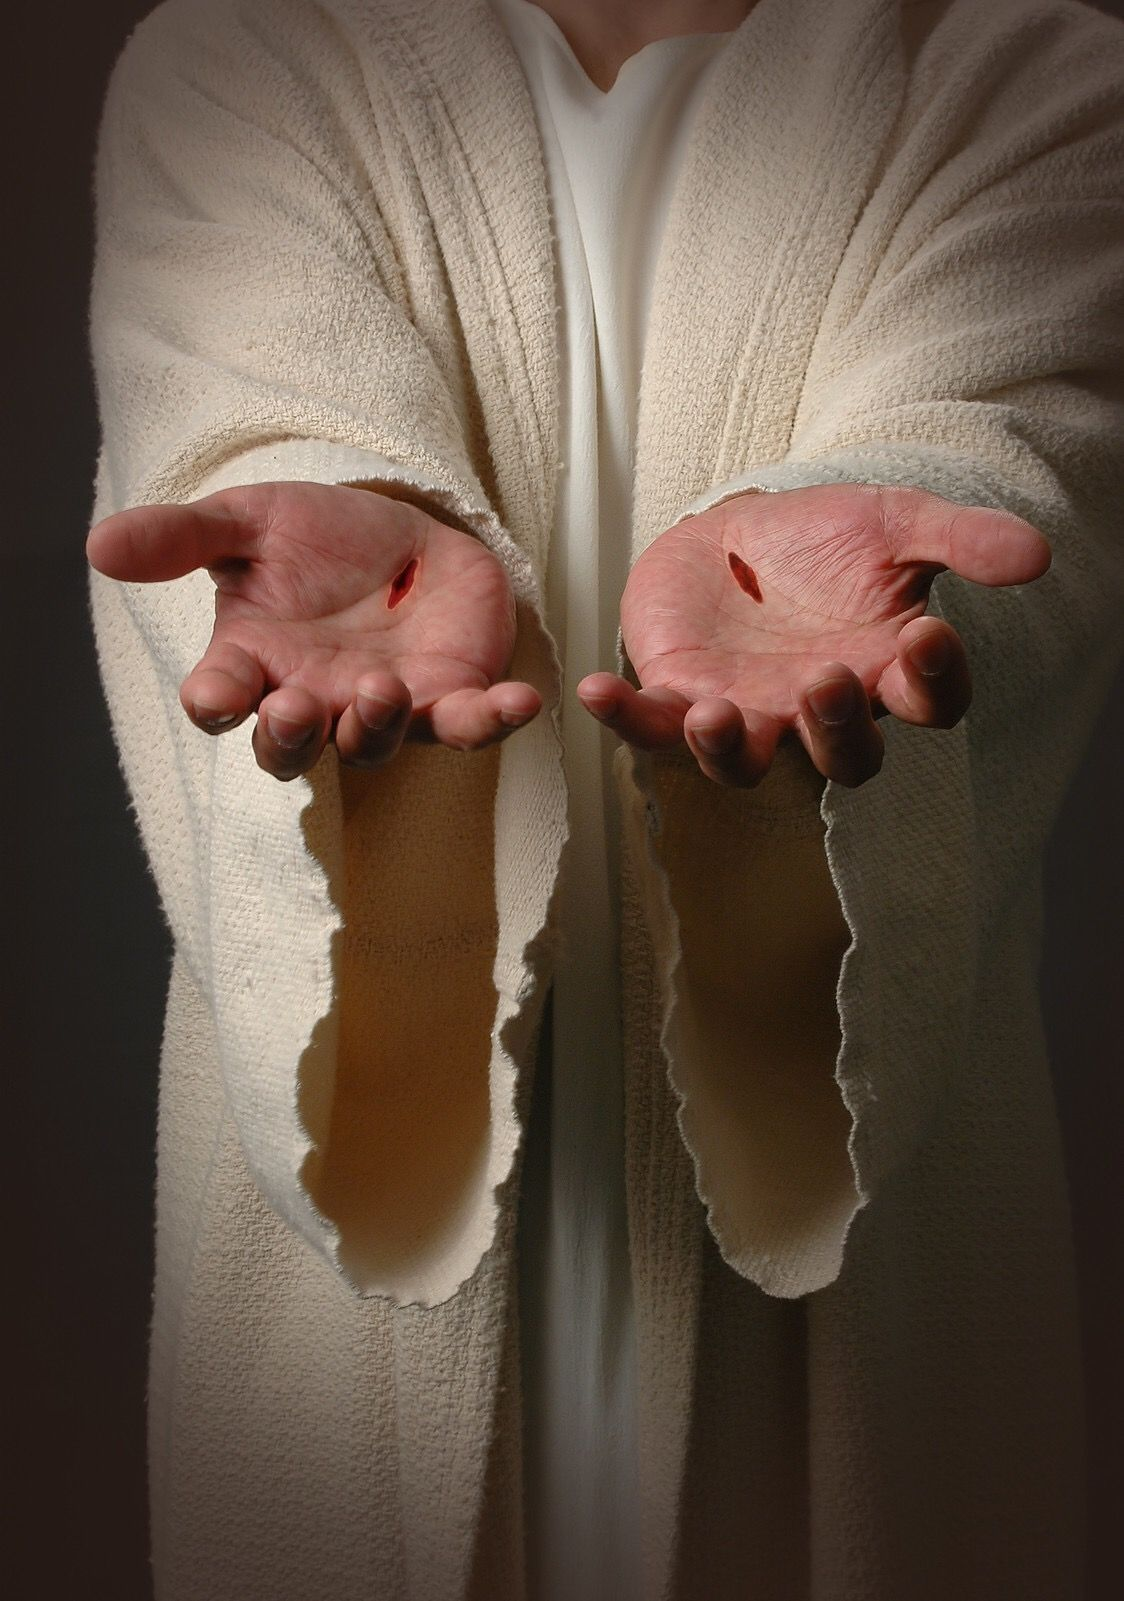 entrega de jesus